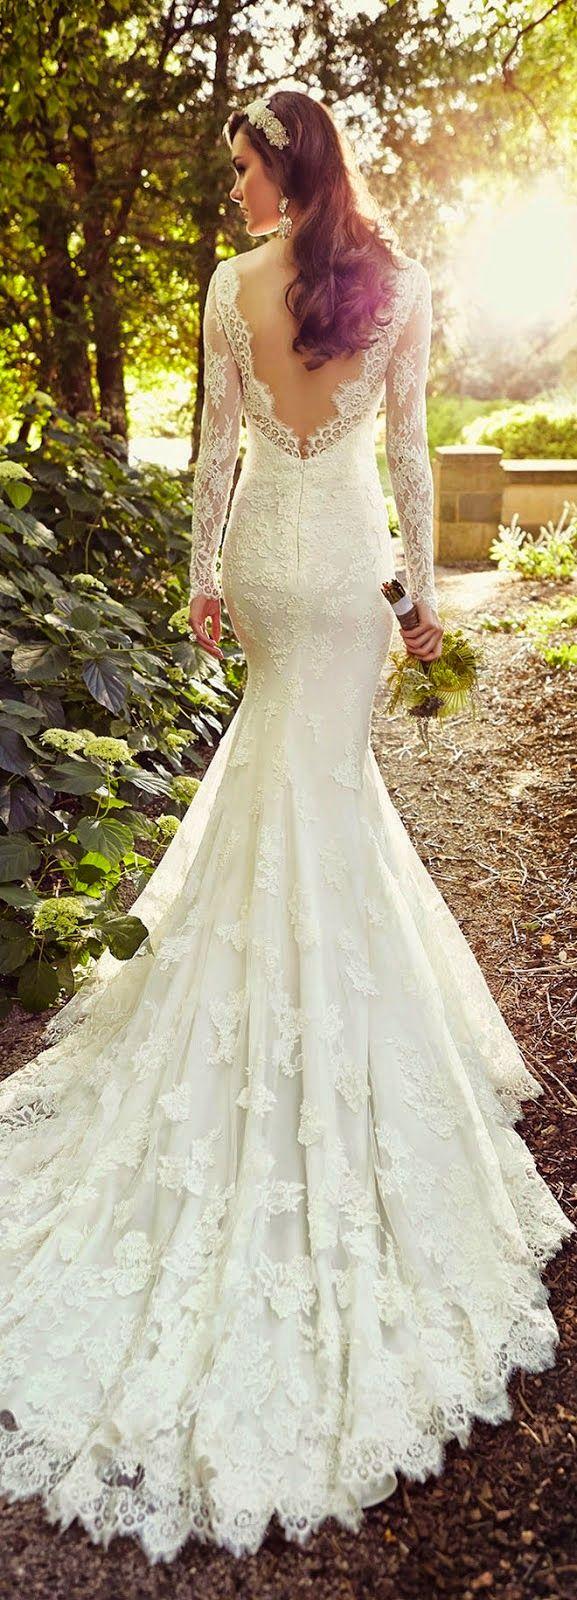 Best weddings ideas on pinterest wedding ideas weddings